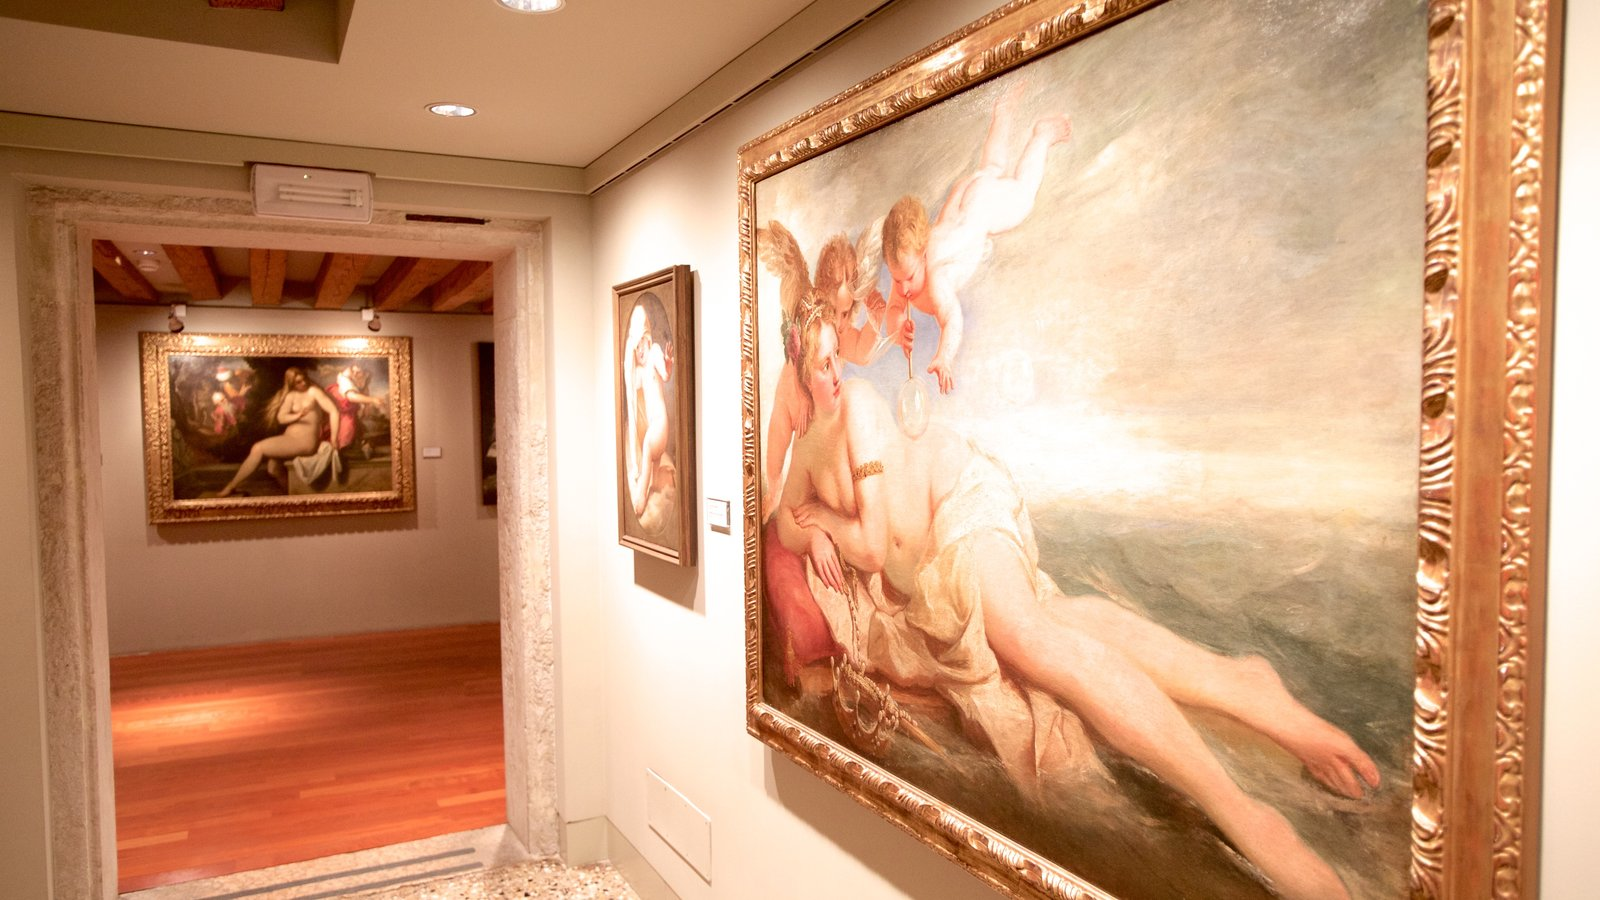 Ca\' Rezzonico caracterizando arte e vistas internas